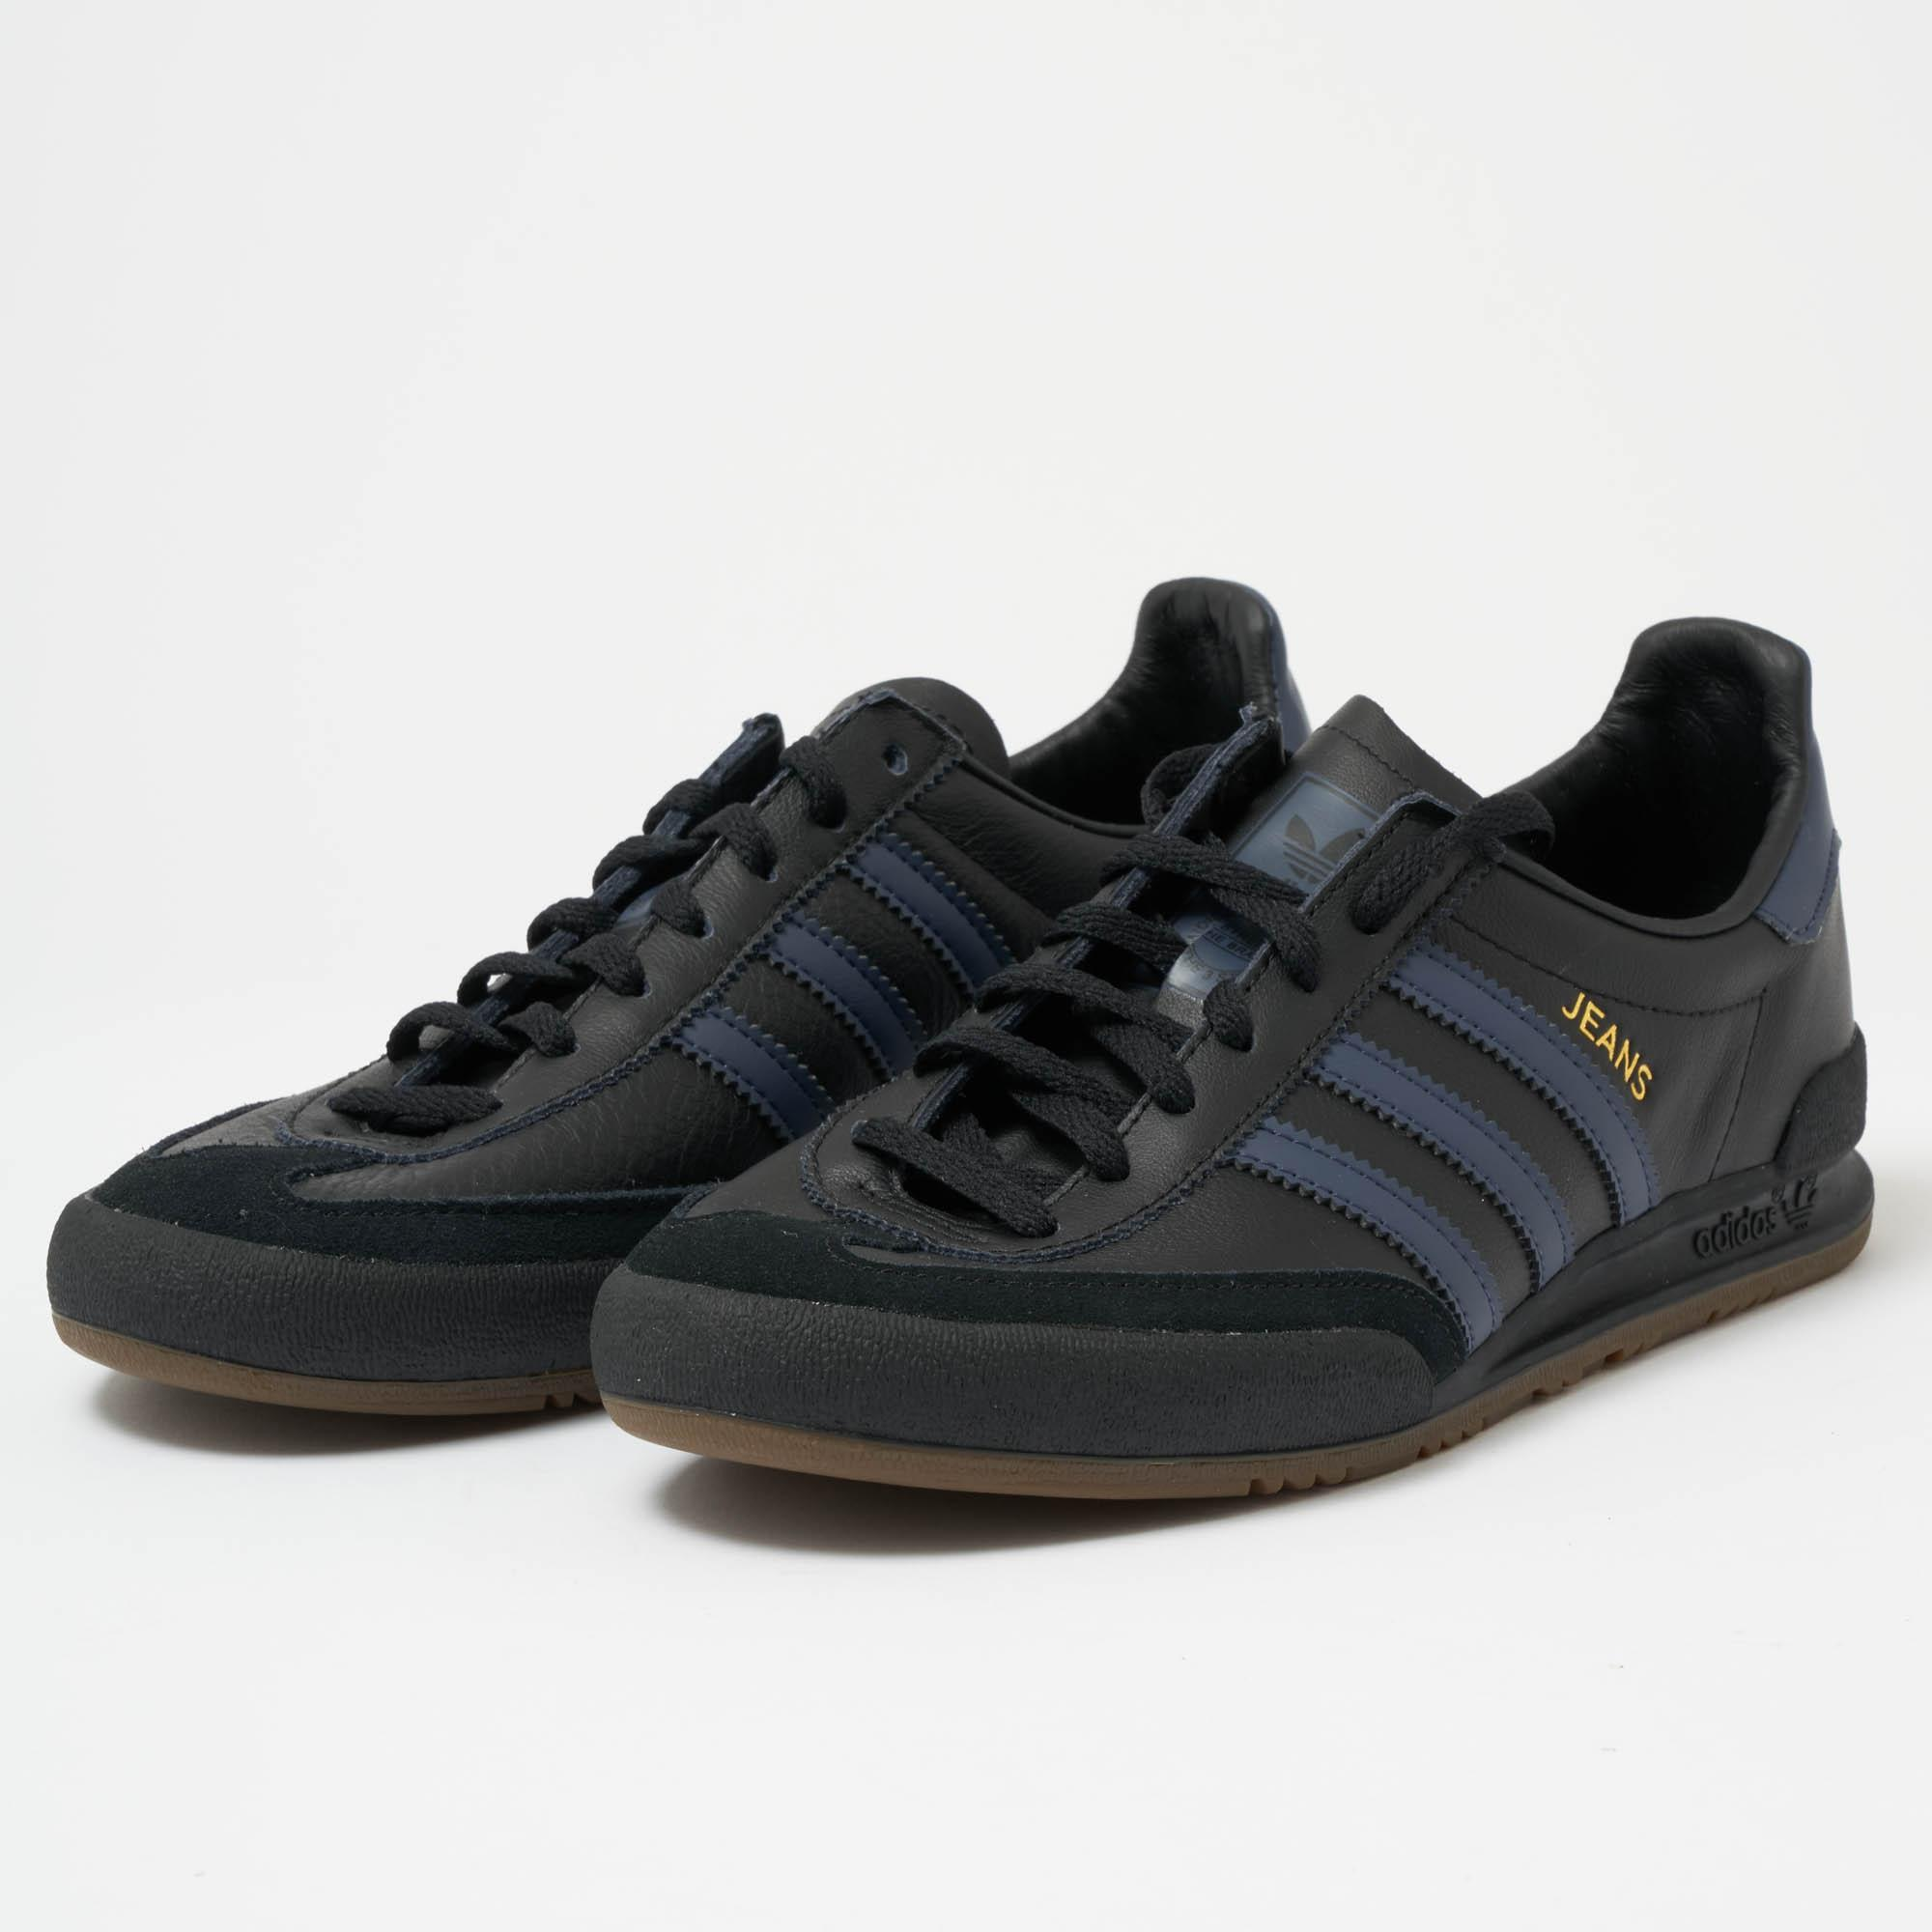 adidas Originals Denim Jeans Core Black, Trace Blue & Gum